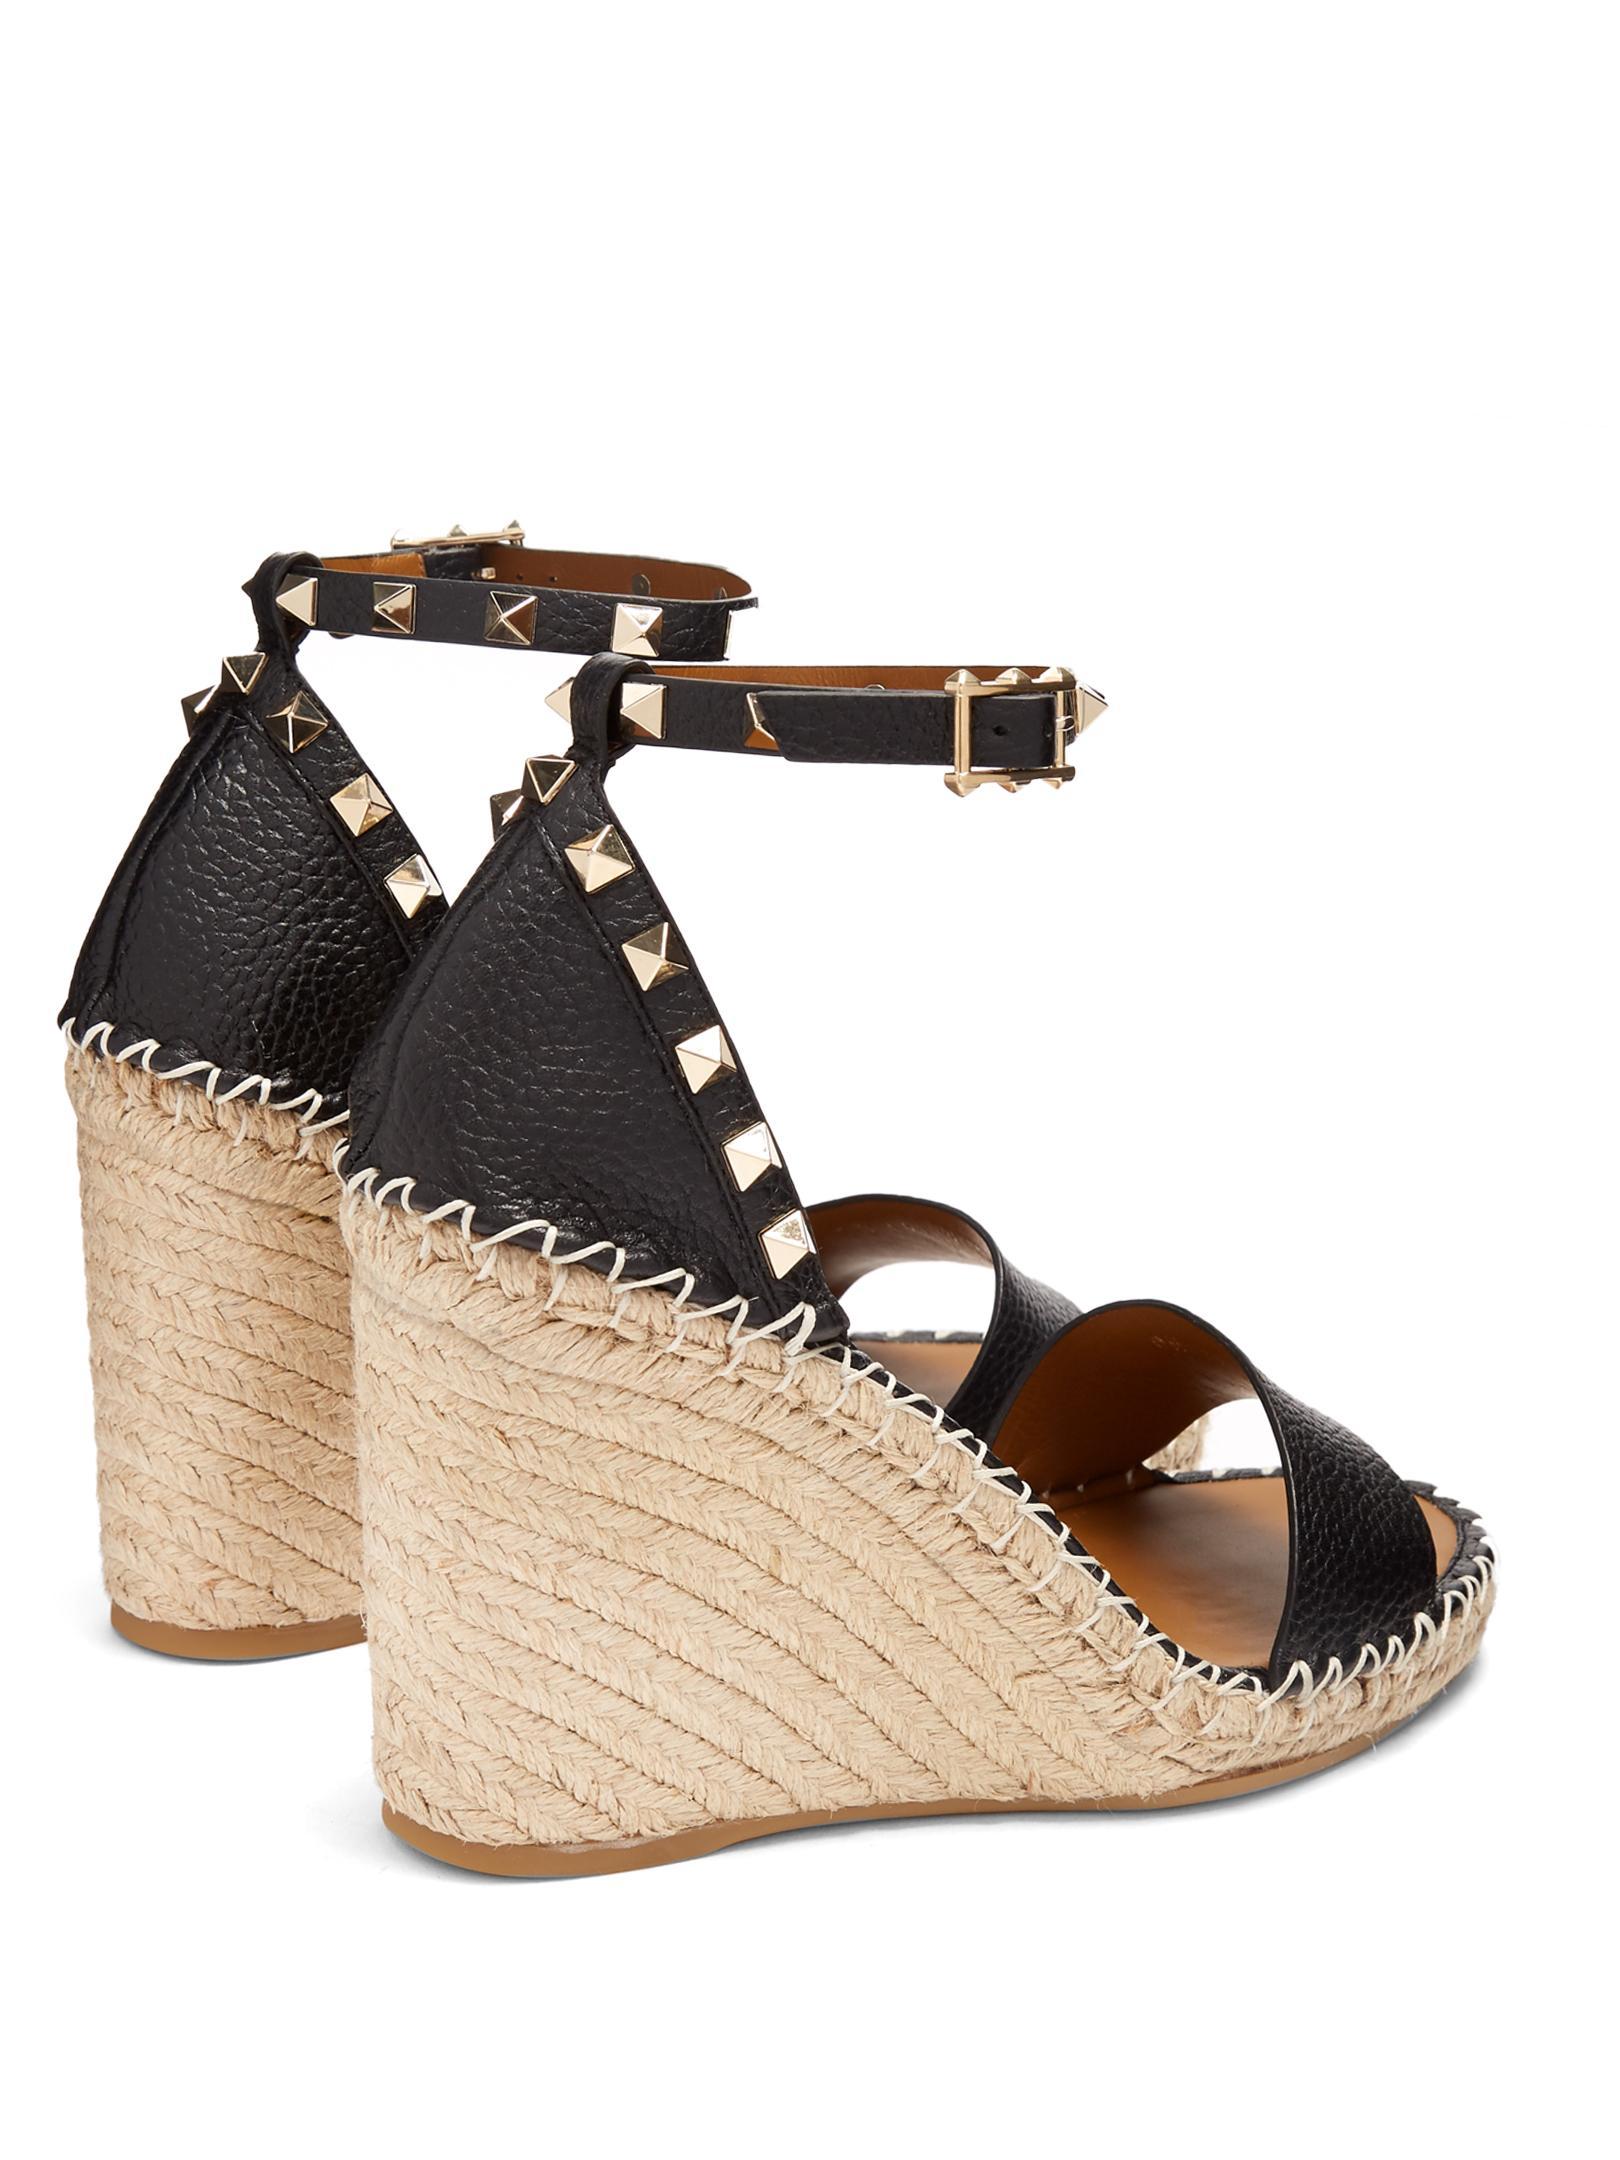 Lyst Valentino Rockstud Leather Espadrille Wedge Sandals